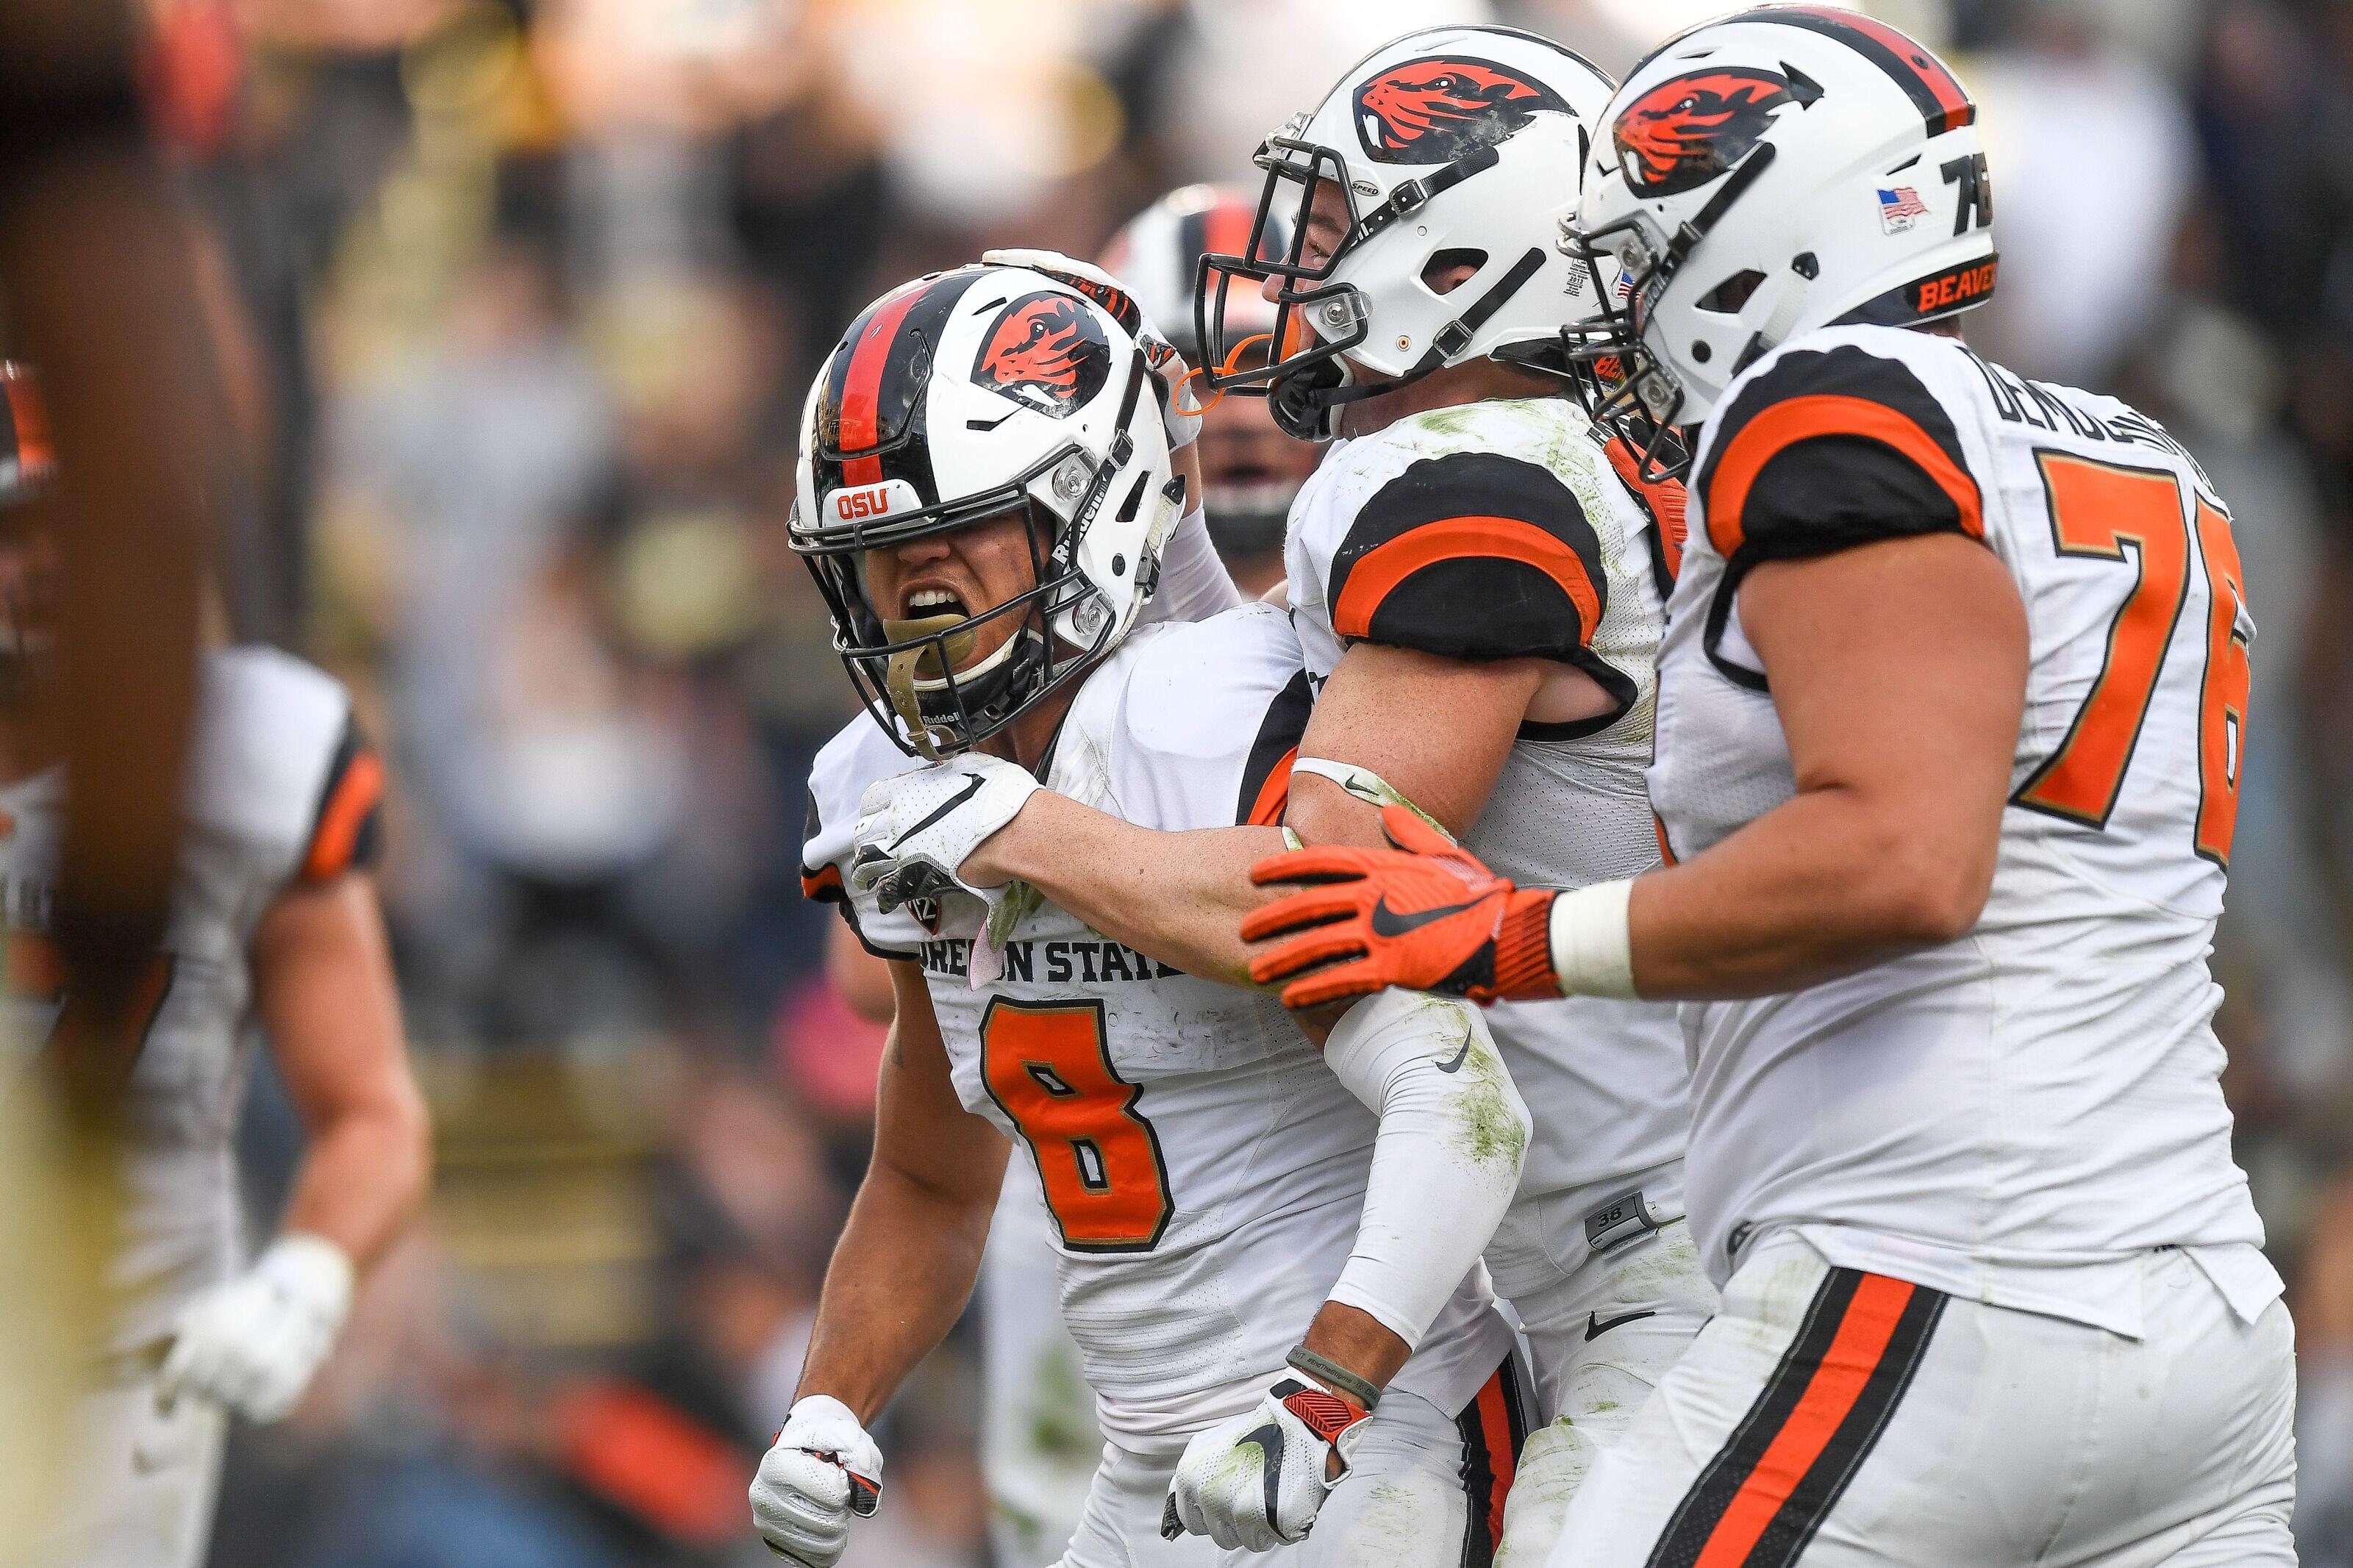 Oregon Football: Ducks Look To Solve Road Woes In Civil War